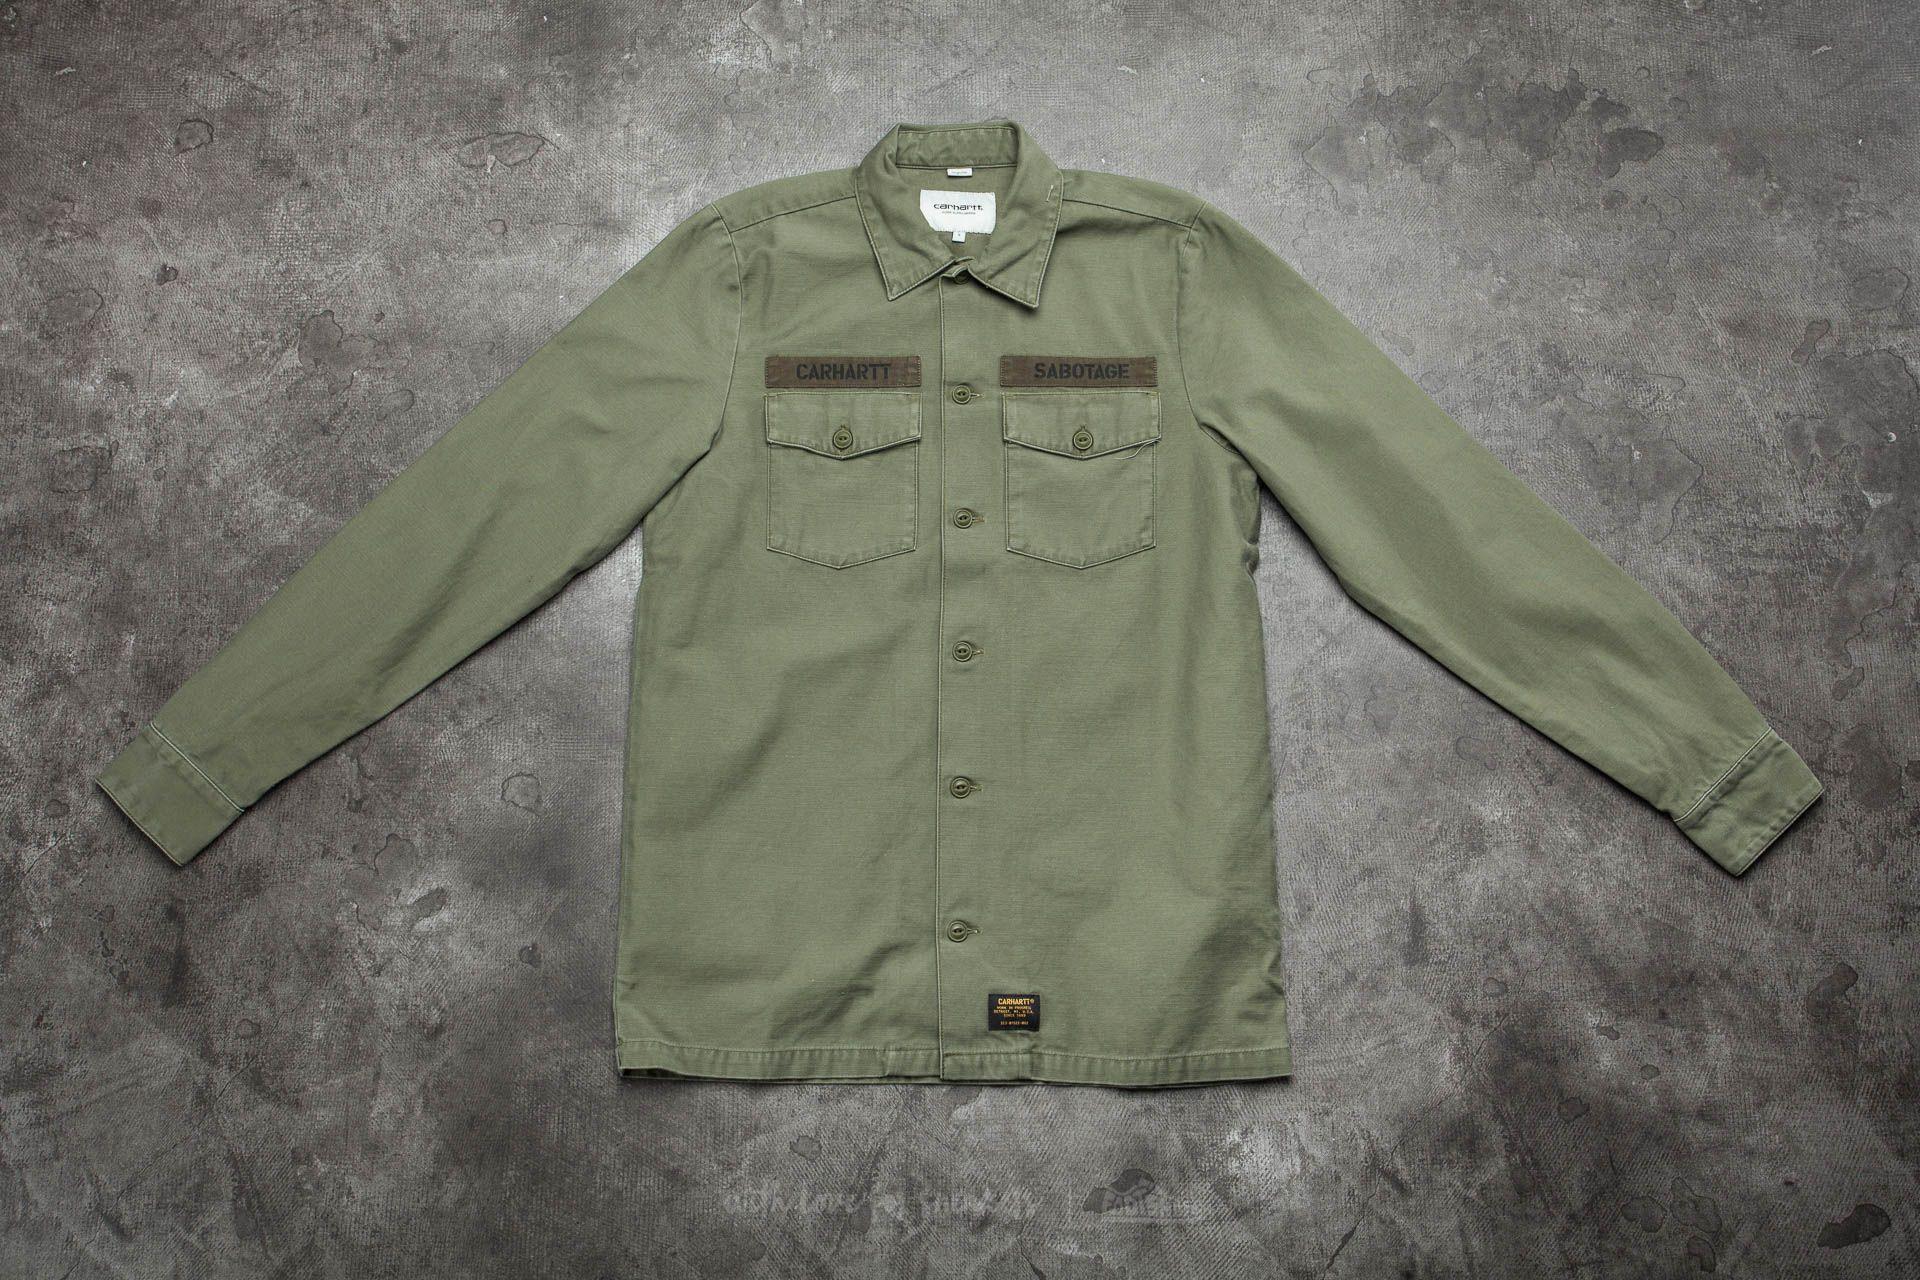 Carhartt WIP Long Sleeve Arrow Shirt Rover Green/ Black Stone Washed